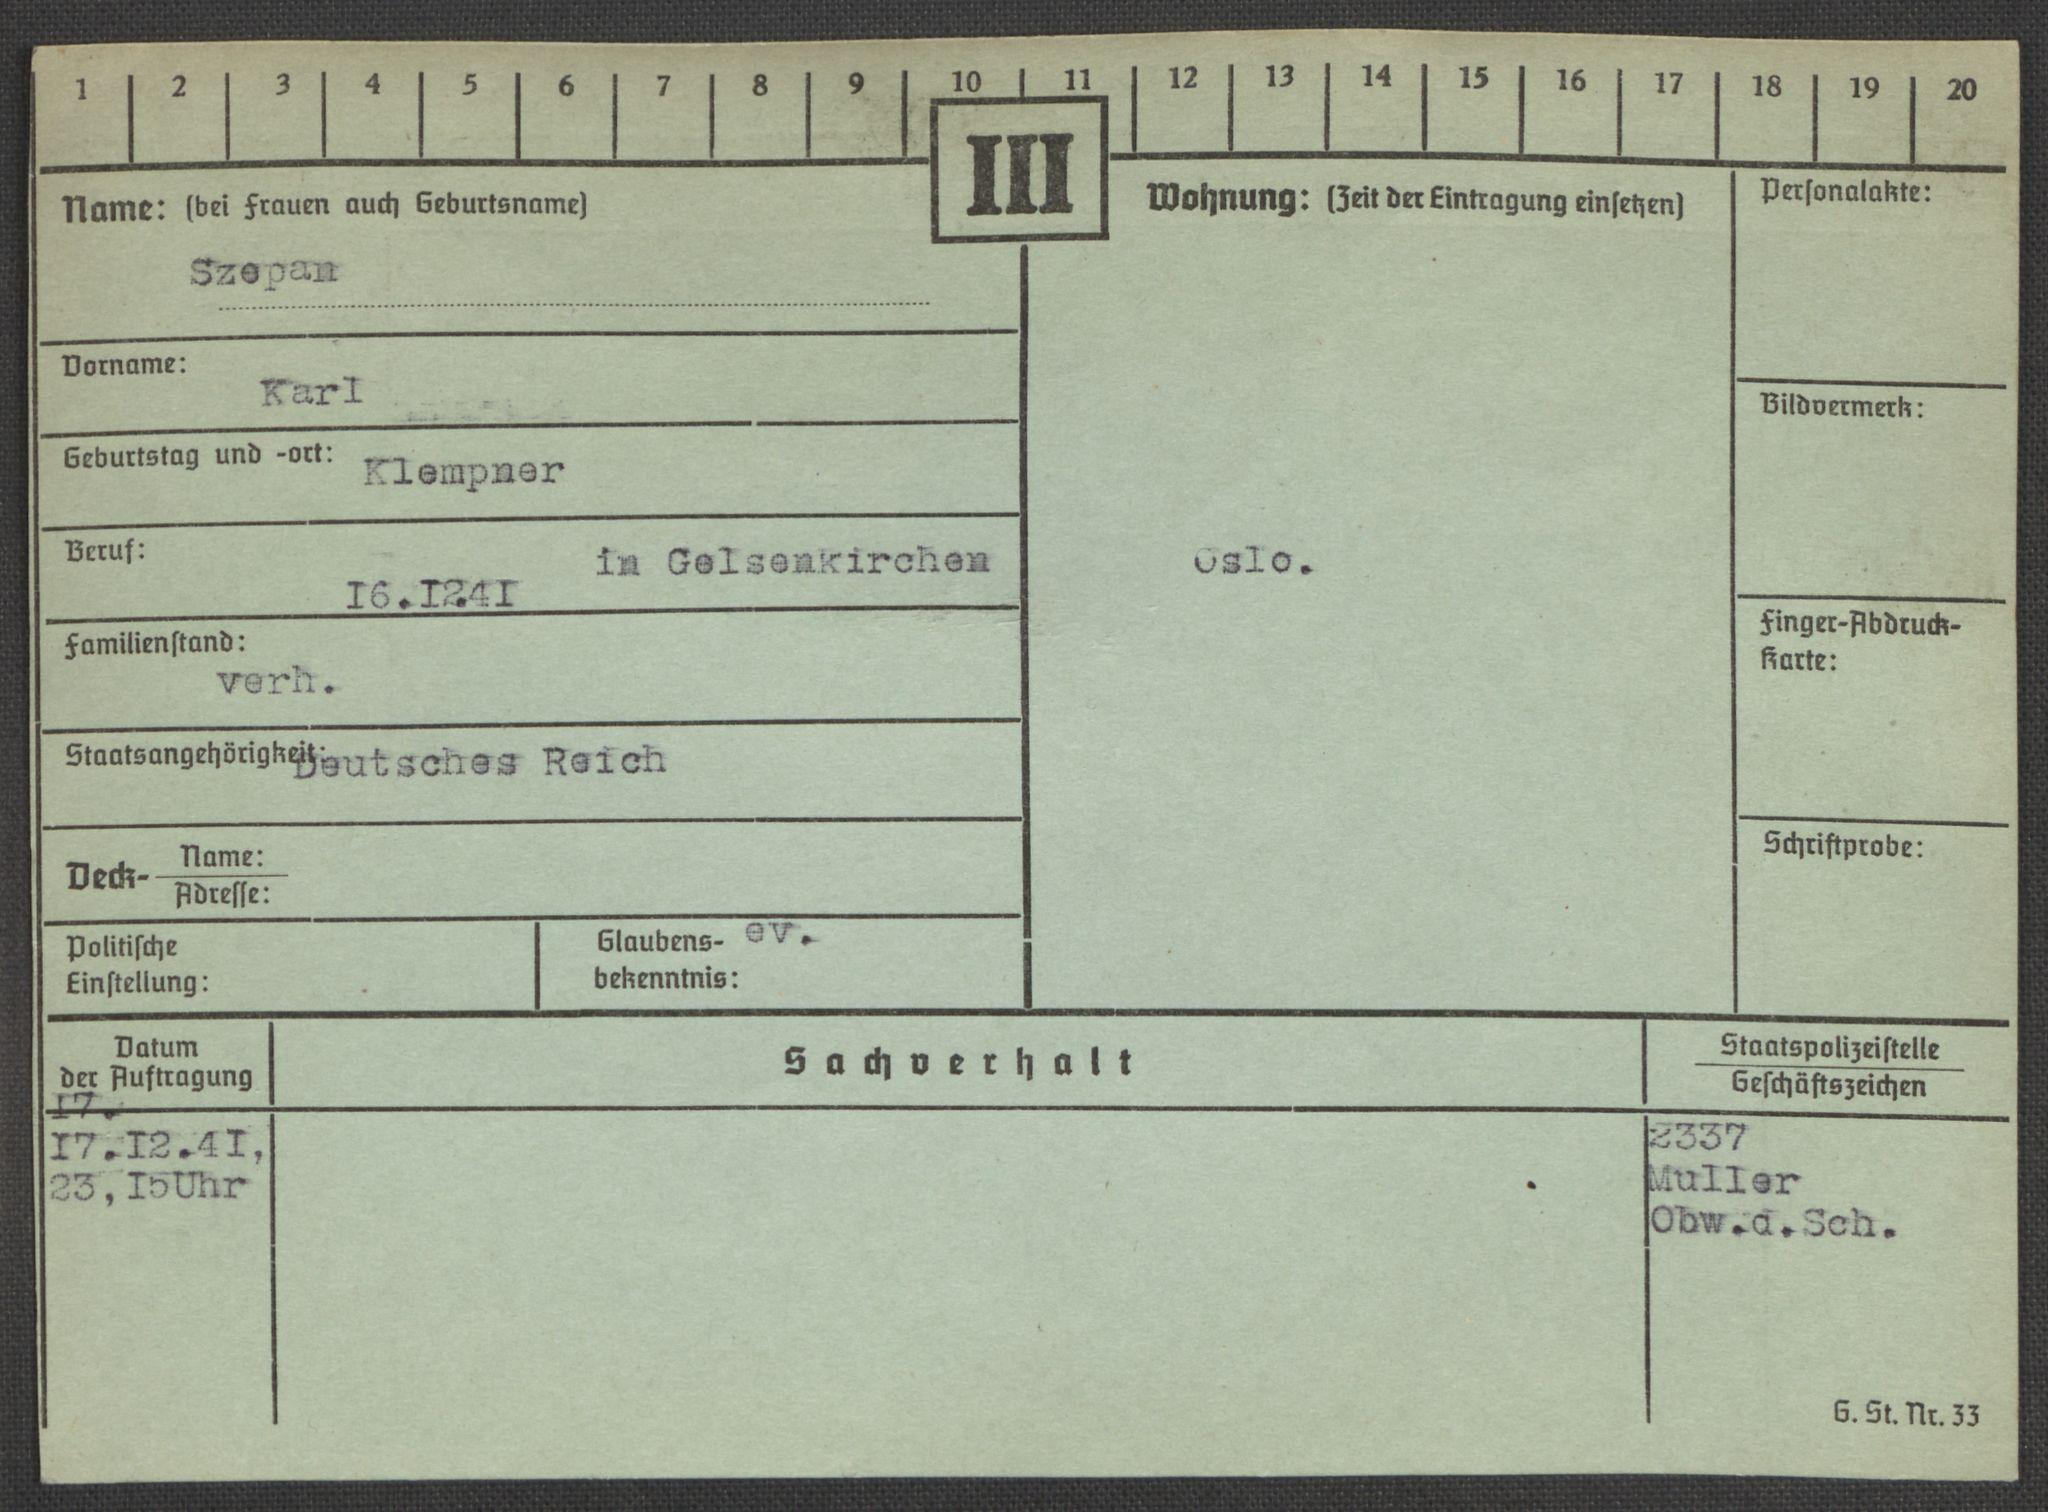 RA, Befehlshaber der Sicherheitspolizei und des SD, E/Ea/Eaa/L0009: Register over norske fanger i Møllergata 19: Ru-Sy, 1940-1945, s. 1656